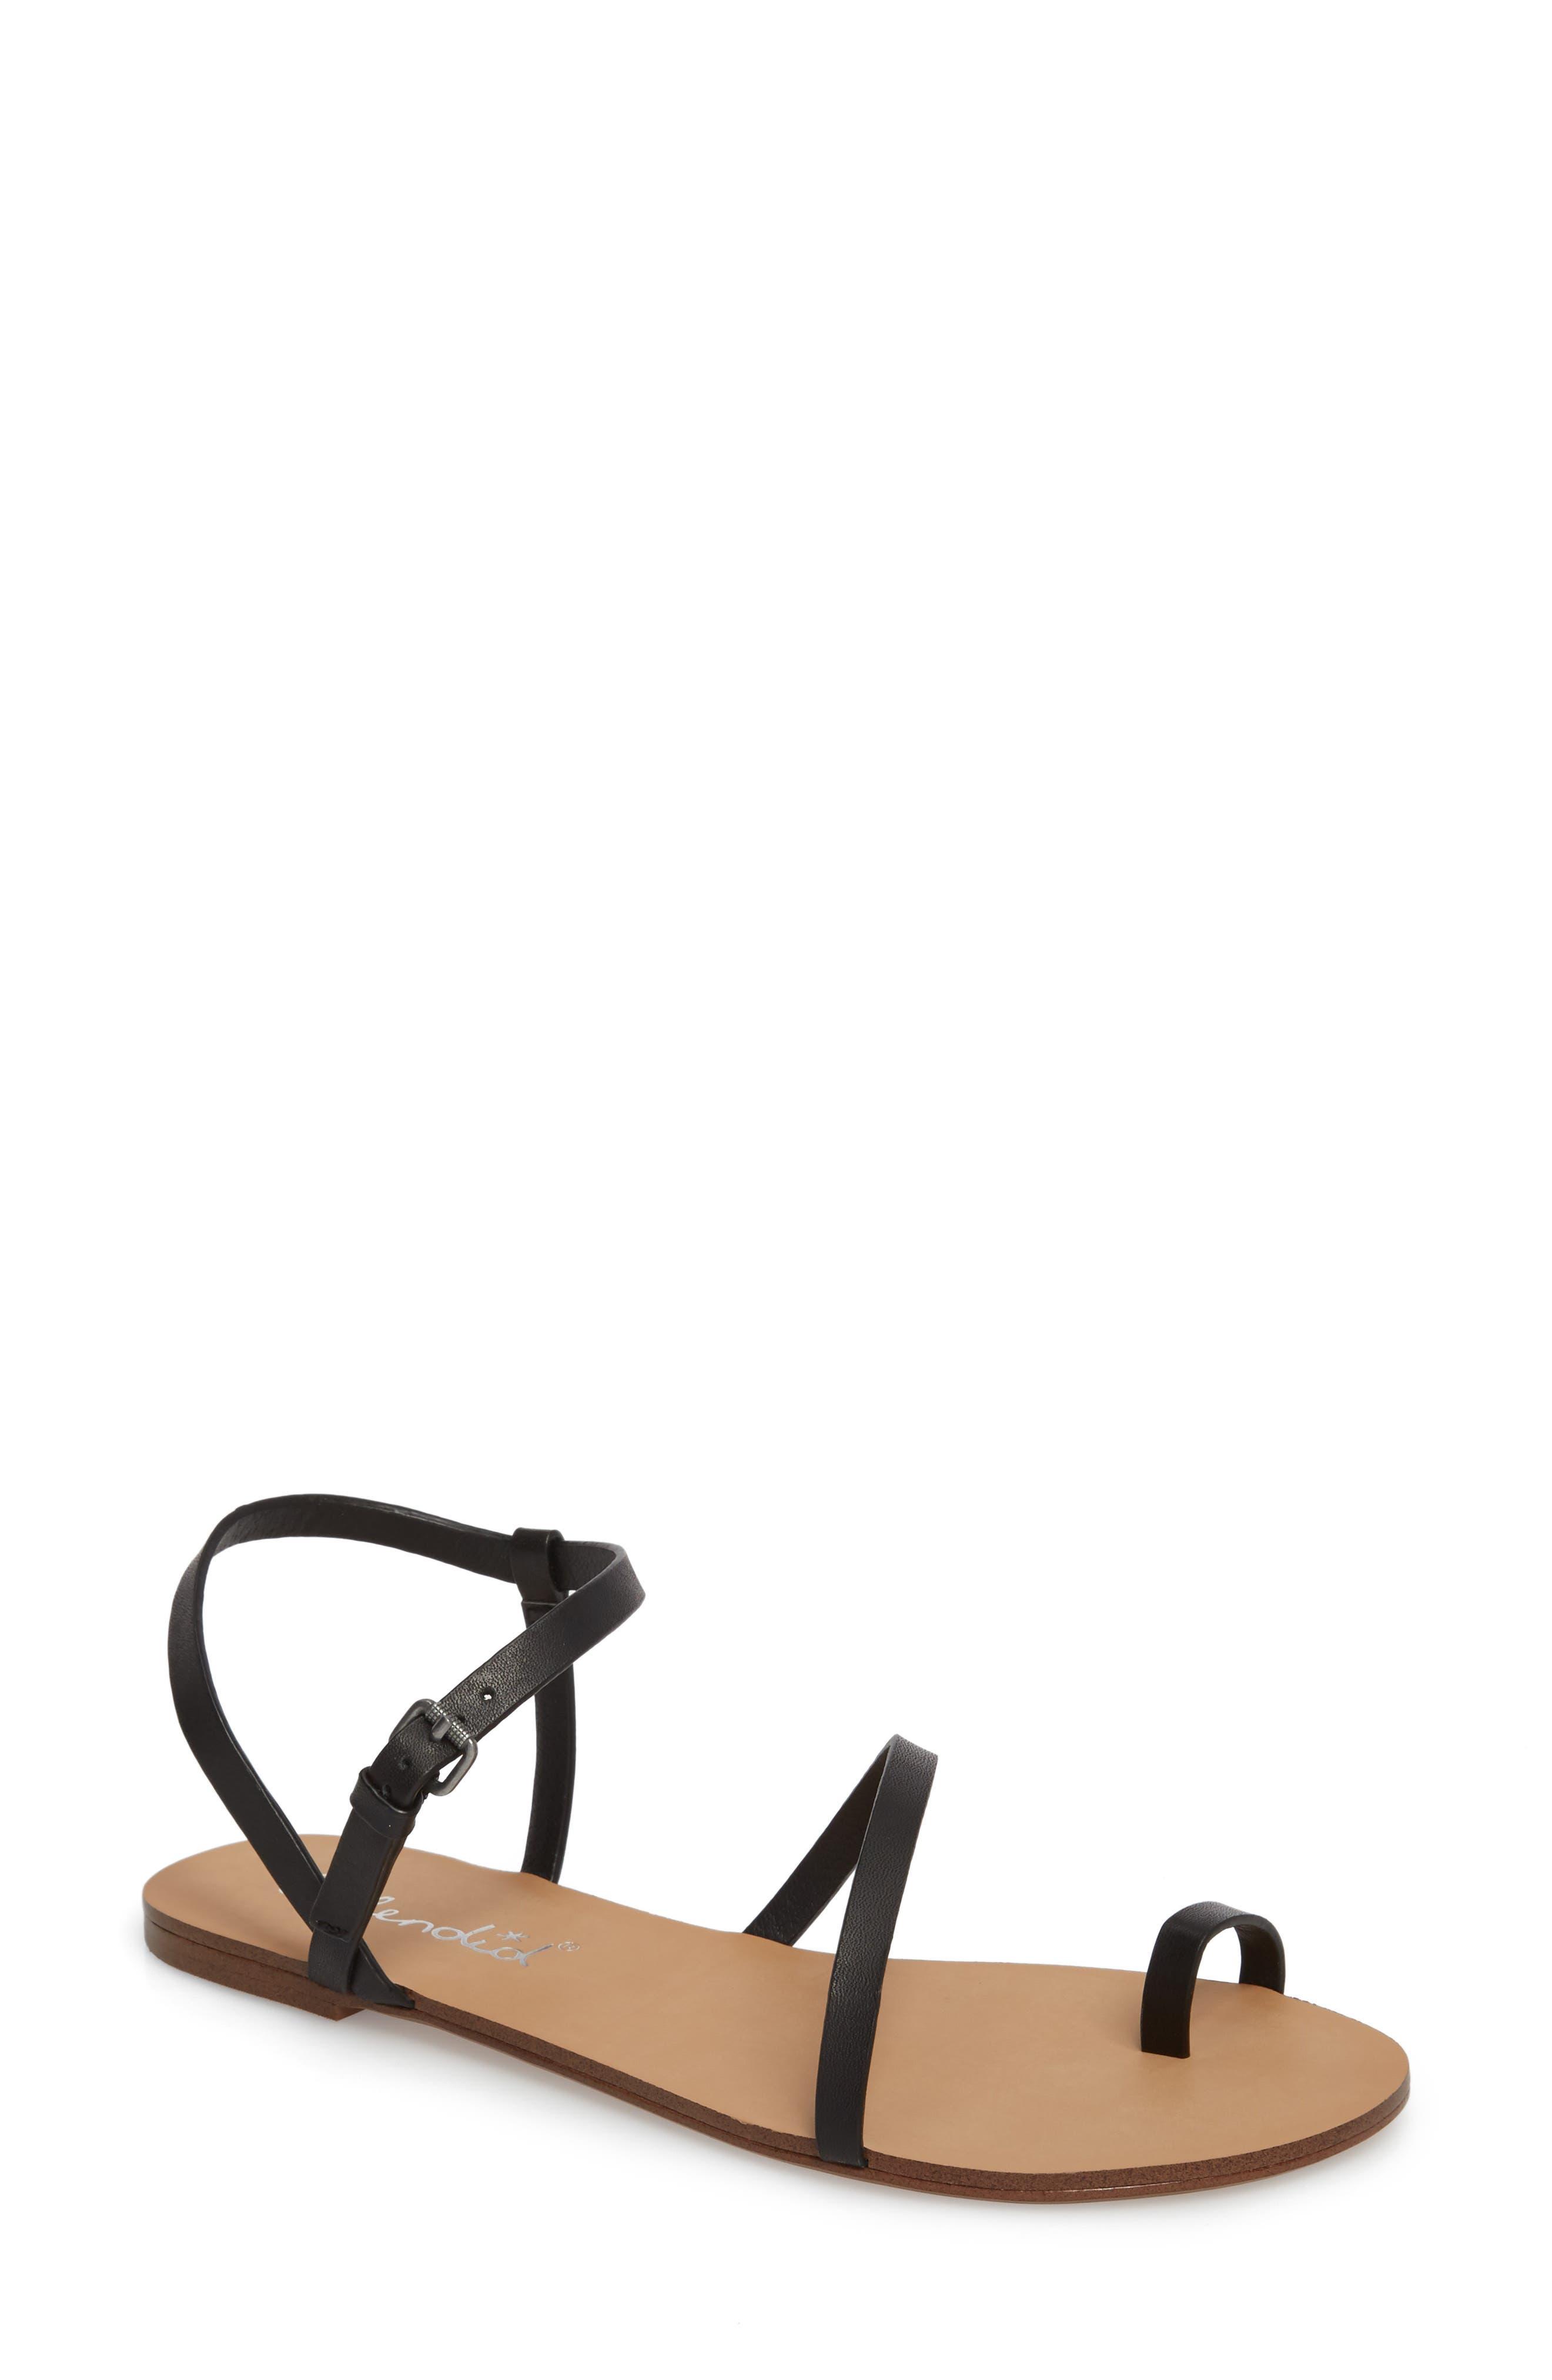 Flower Sandal,                         Main,                         color, Black Leather